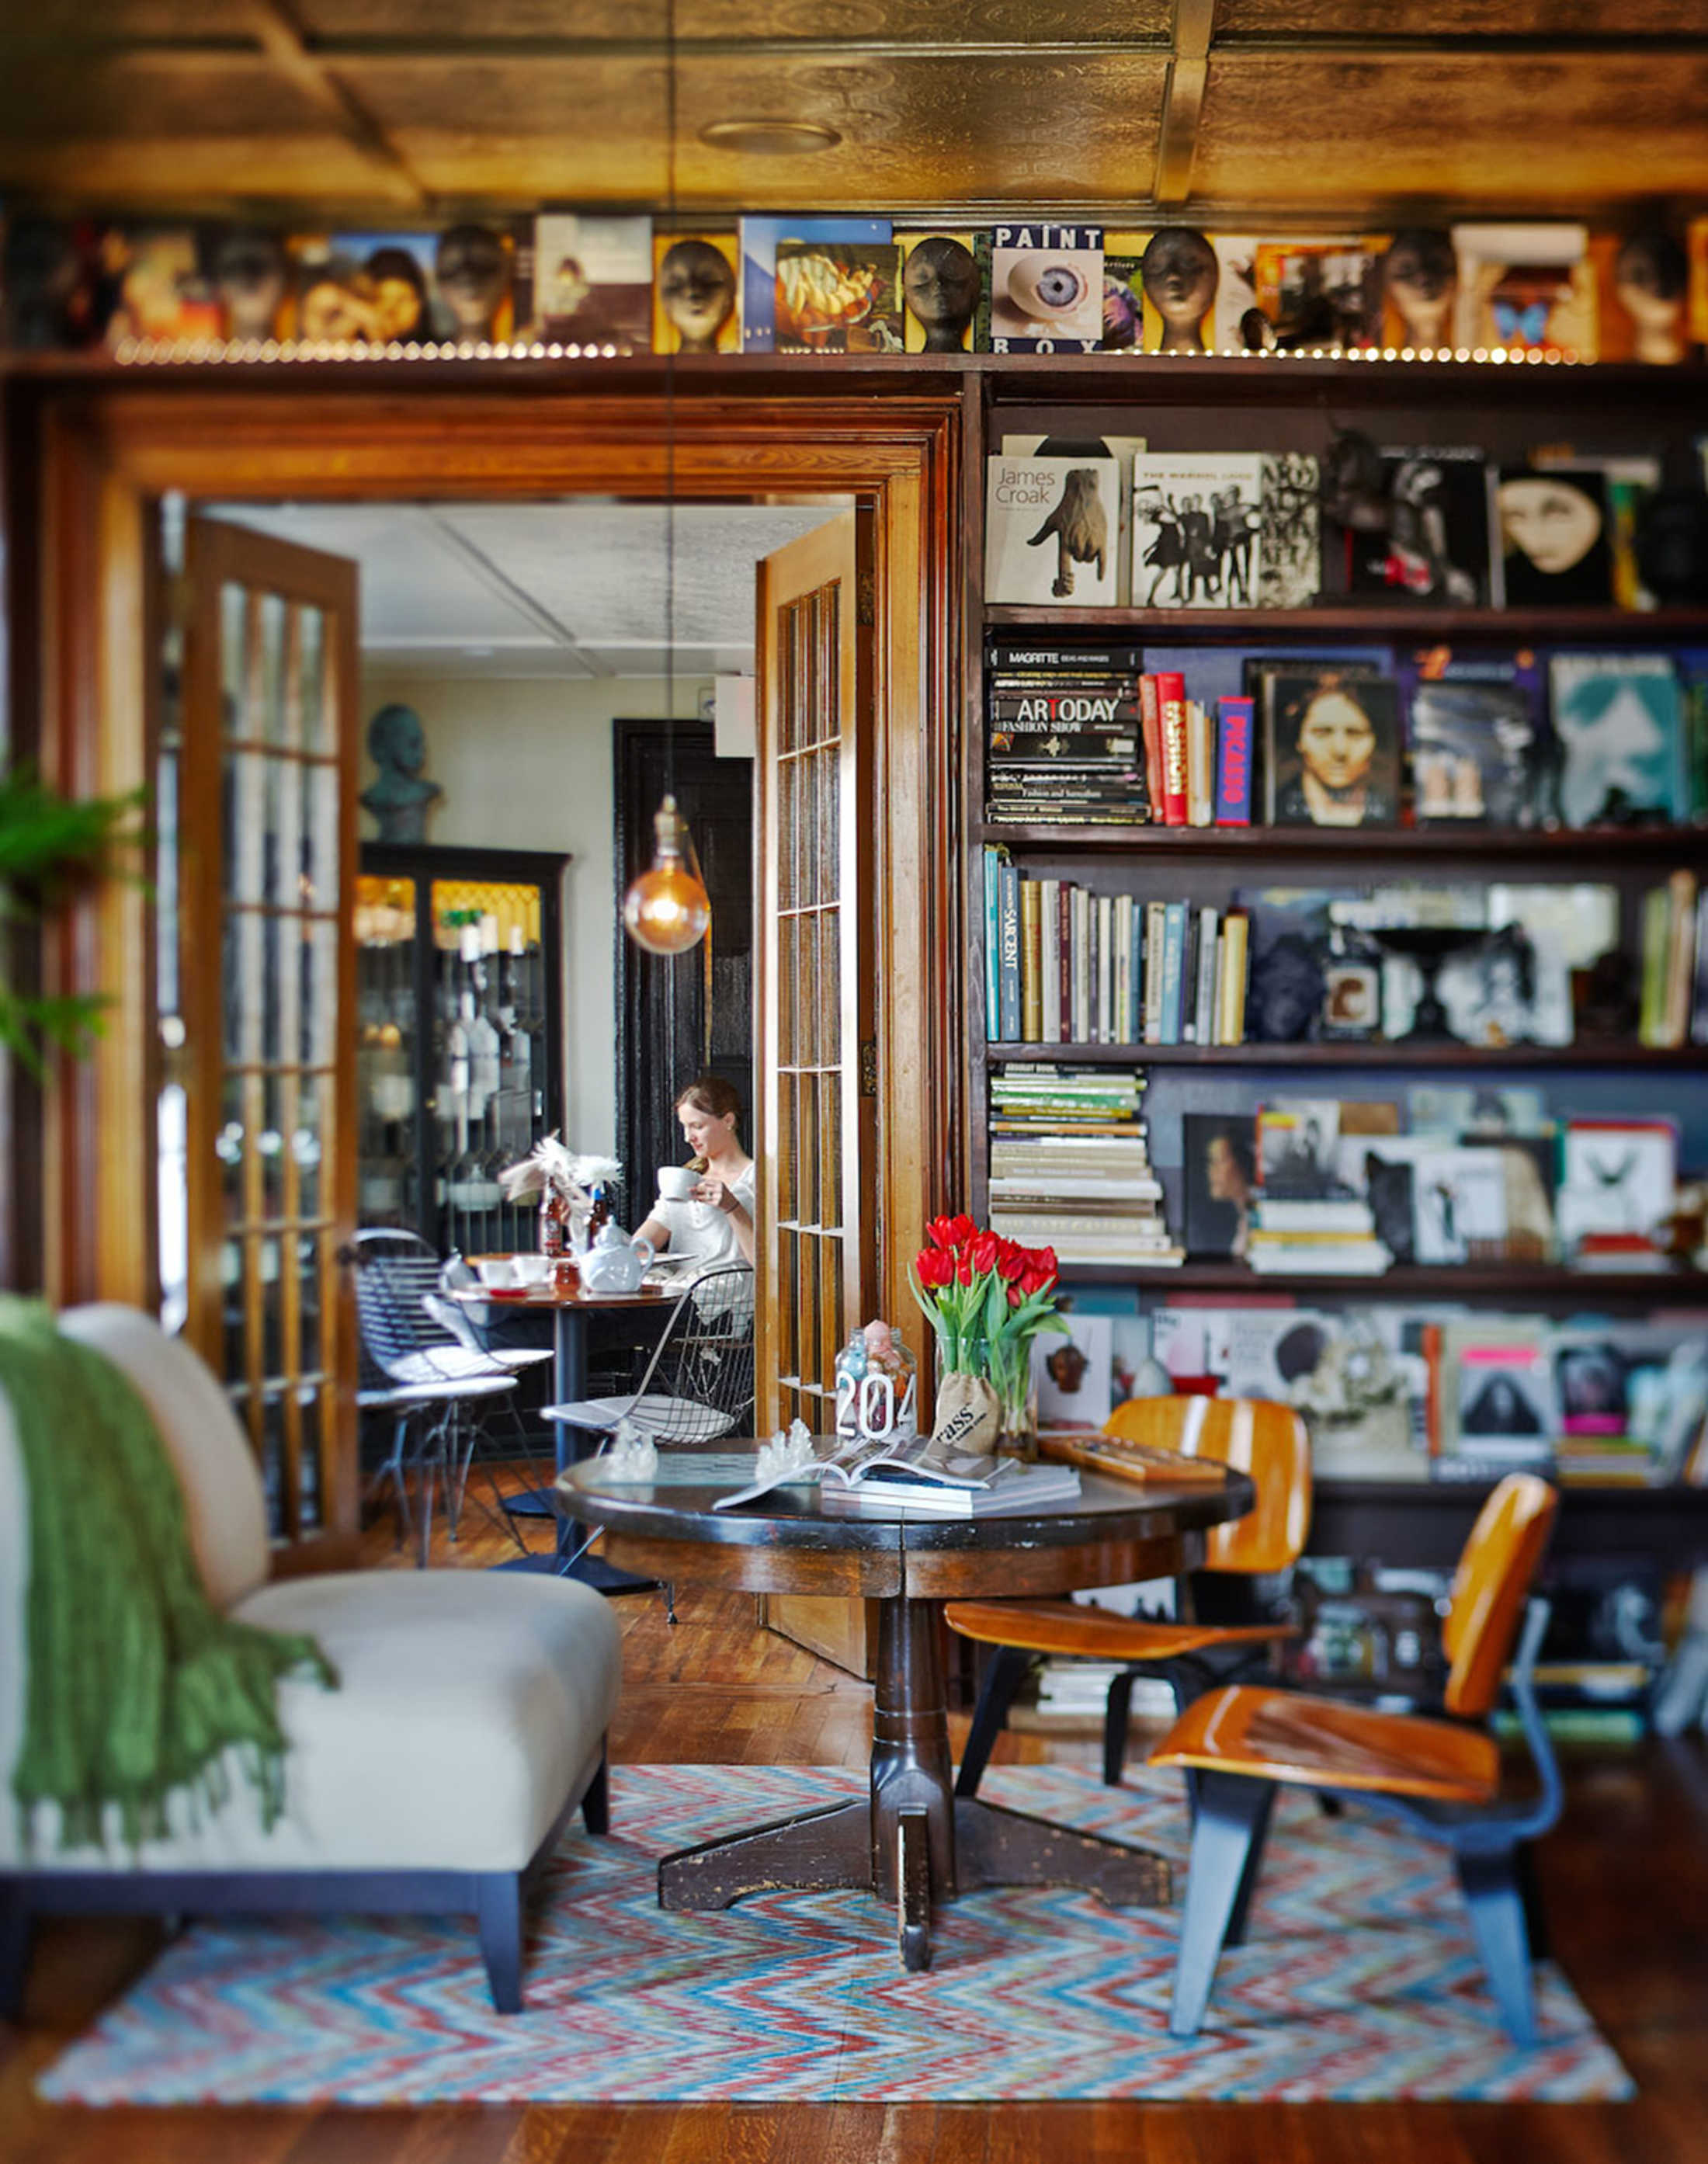 Urban chic award winning inn hotel made inn vermont bb